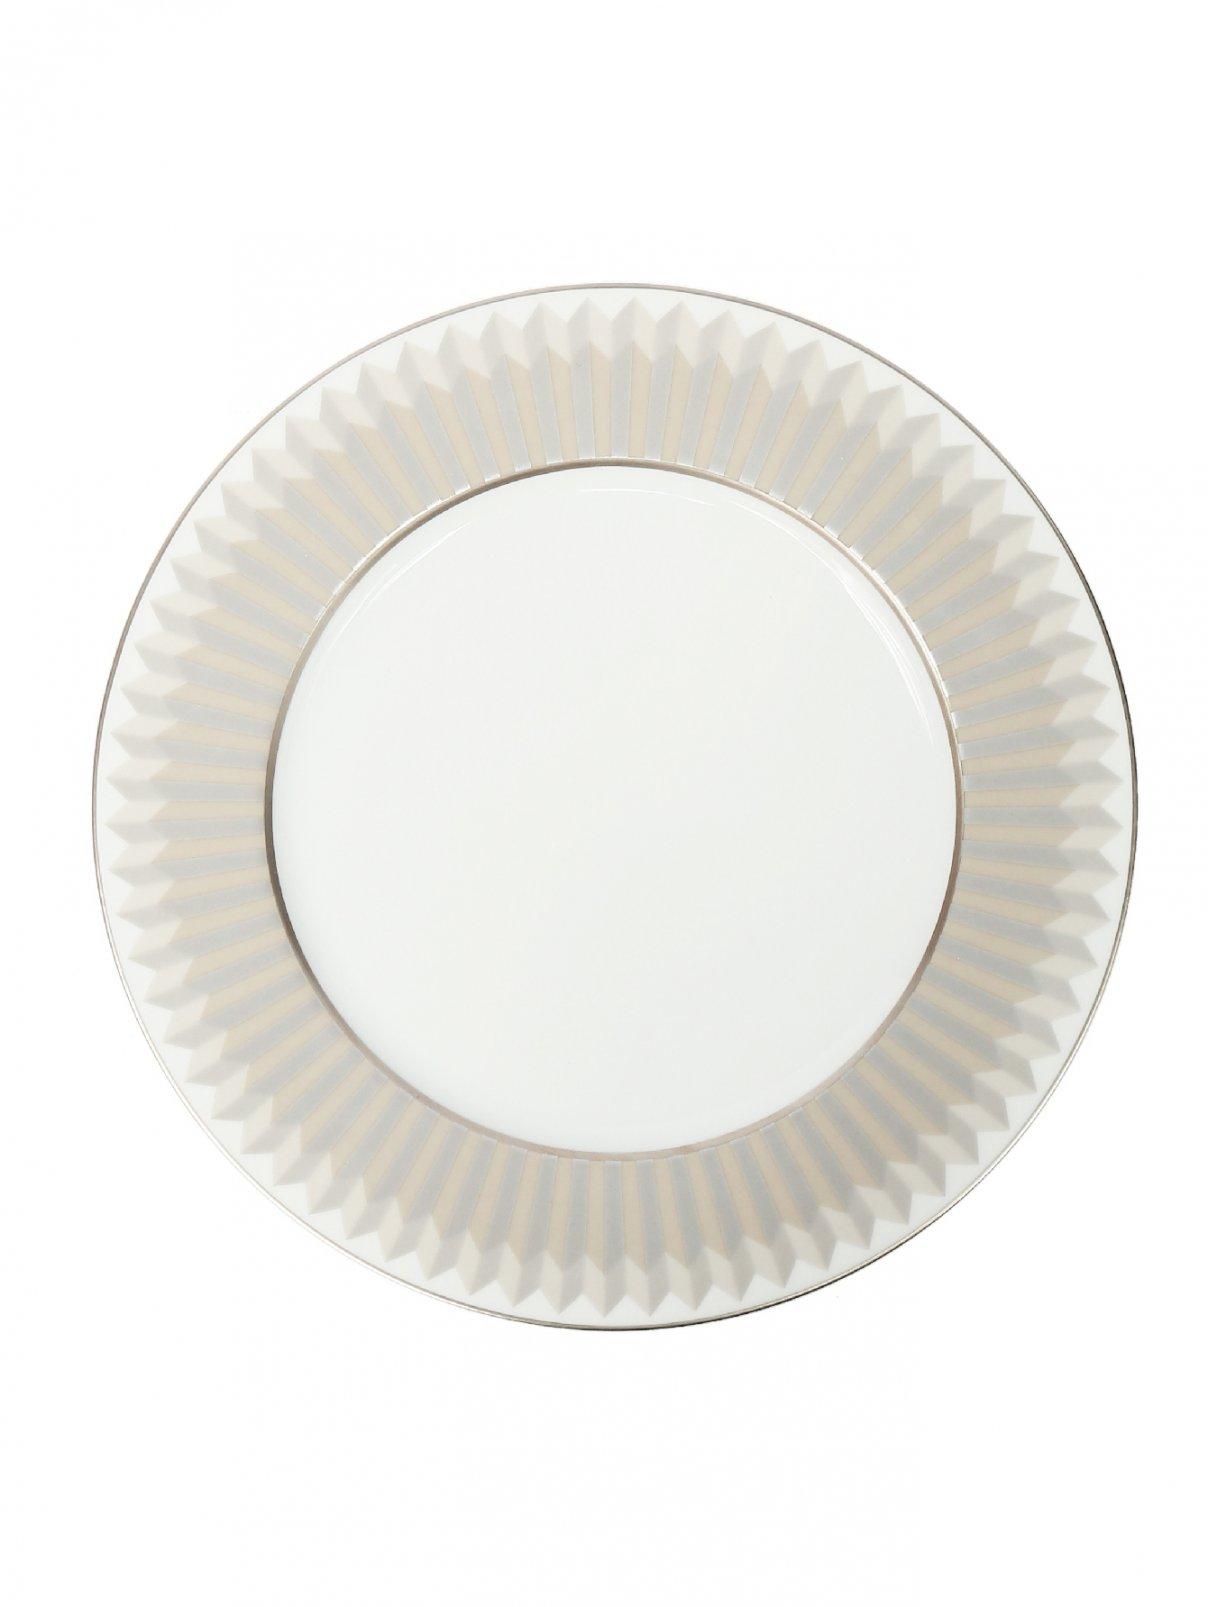 Тарелка обеденная с геометрическим узором Haviland  –  Общий вид